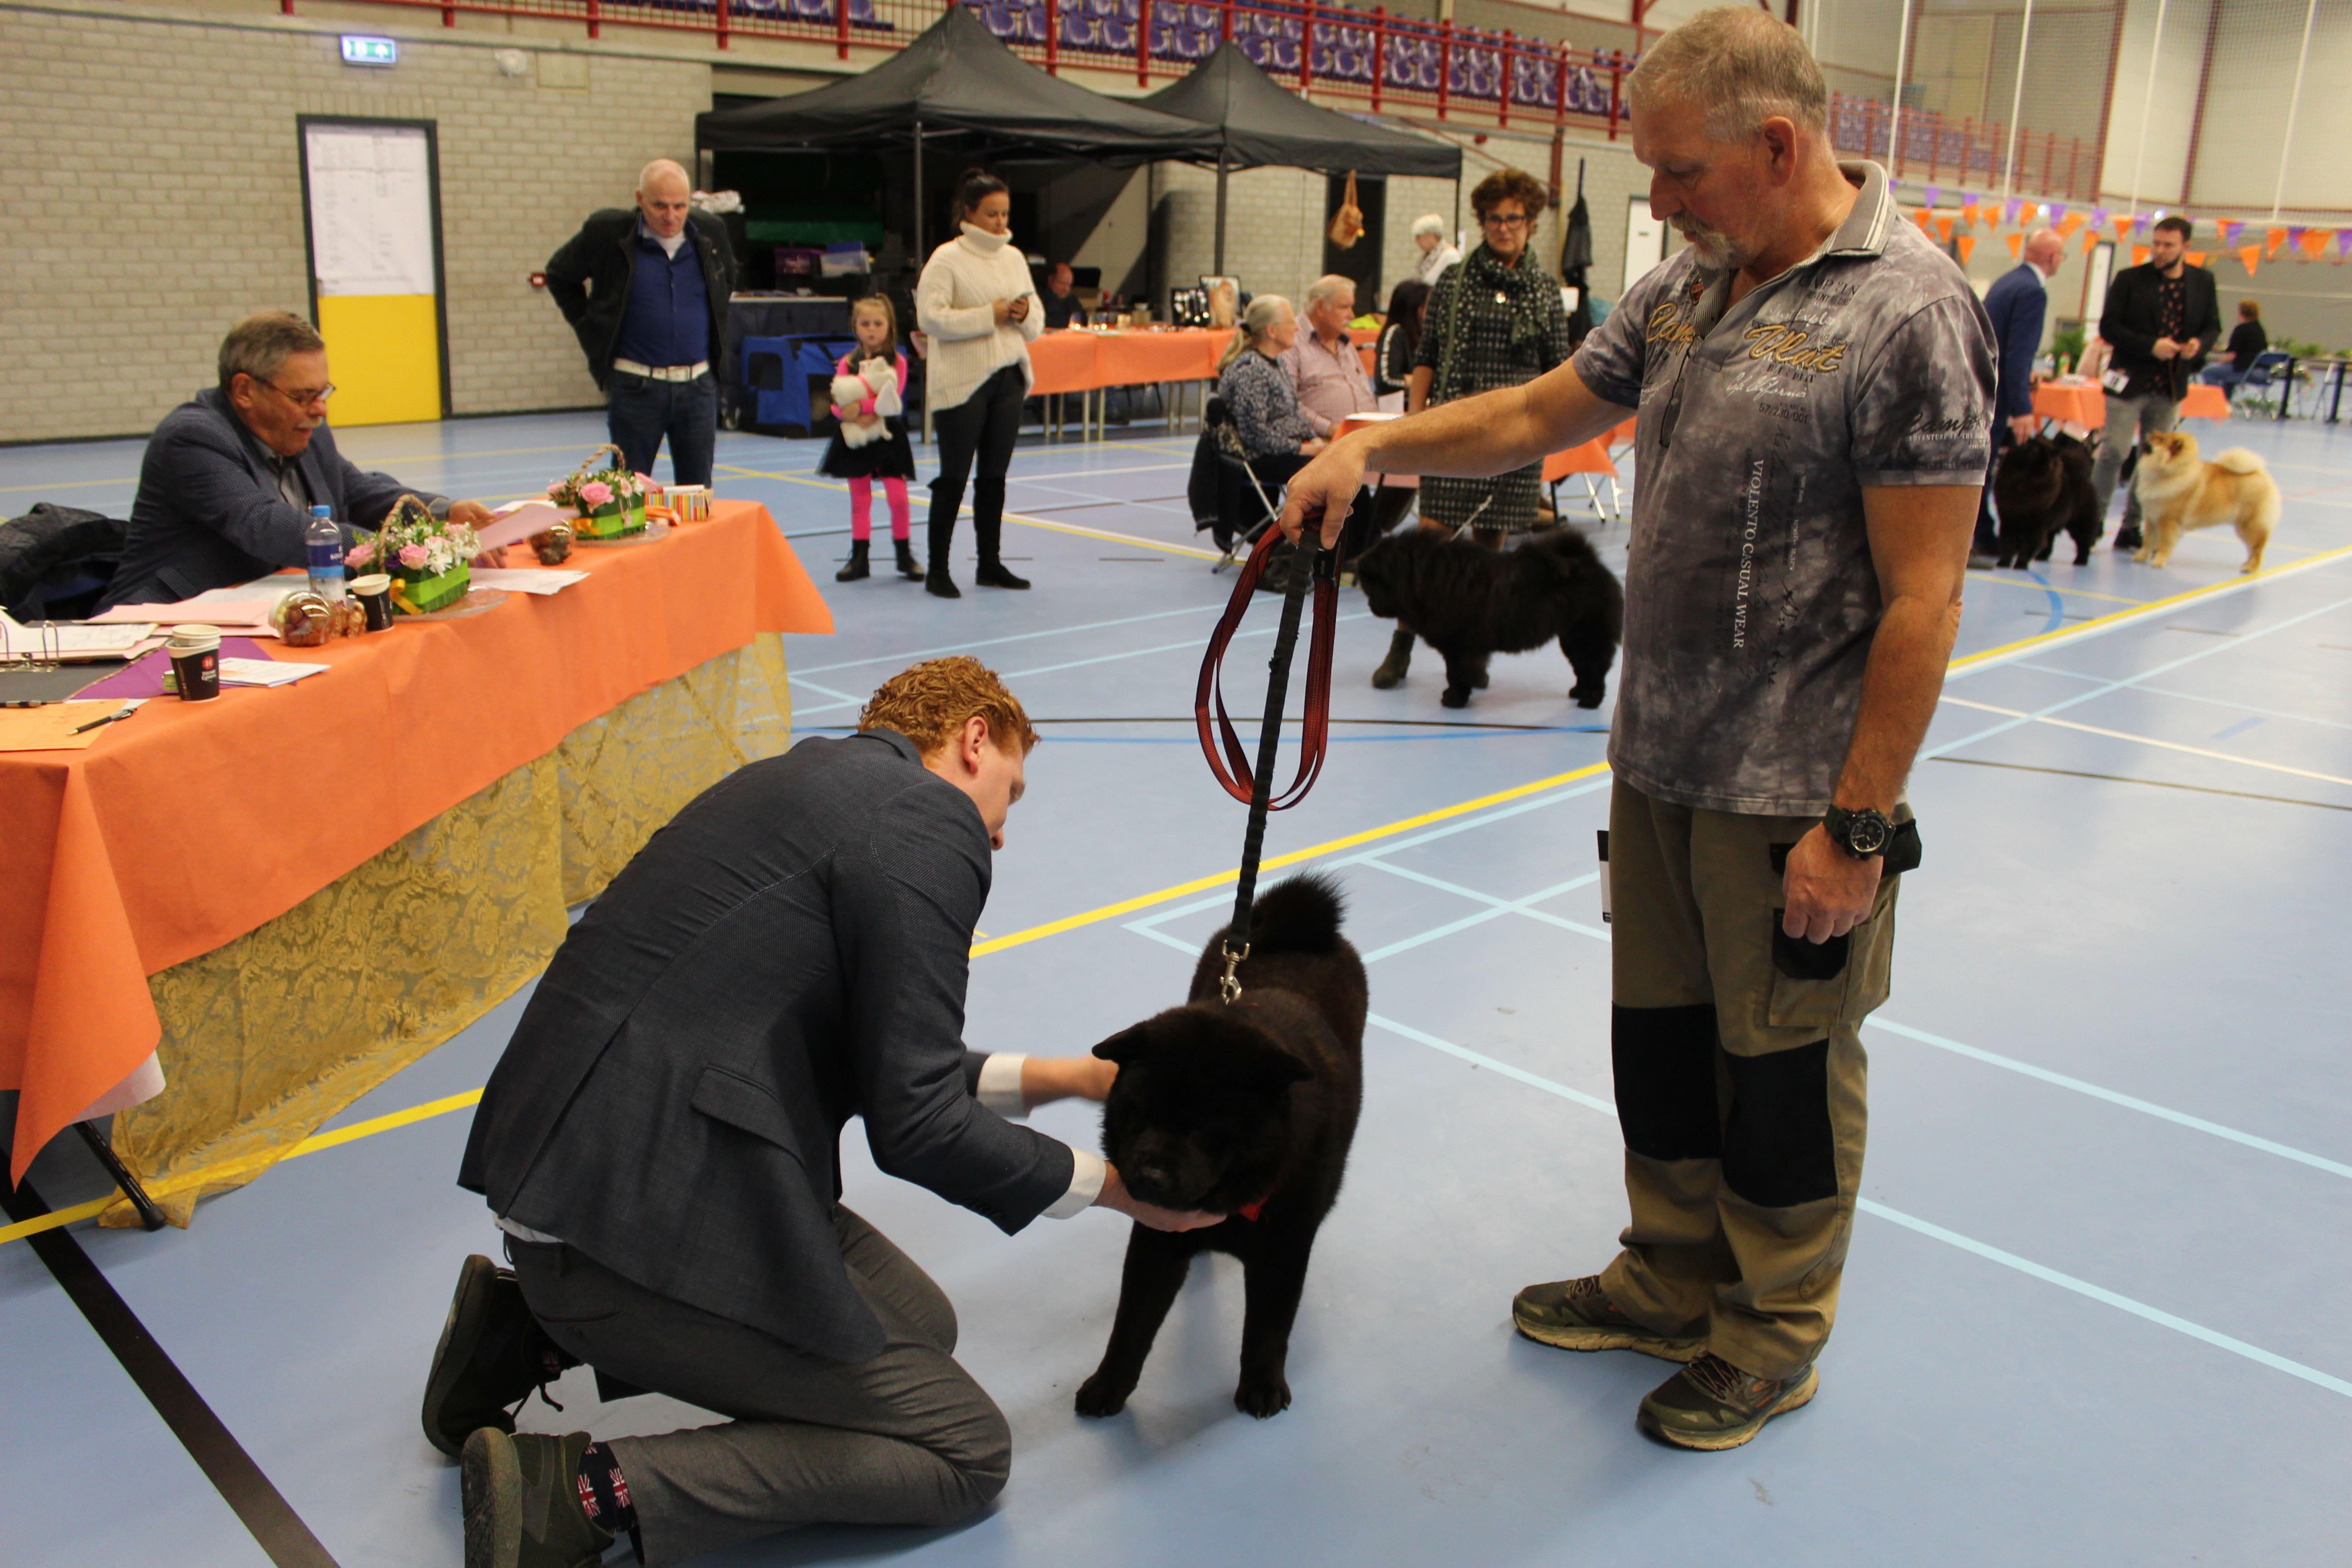 catnr-19-Mayka-Lying-van-Juttersburch